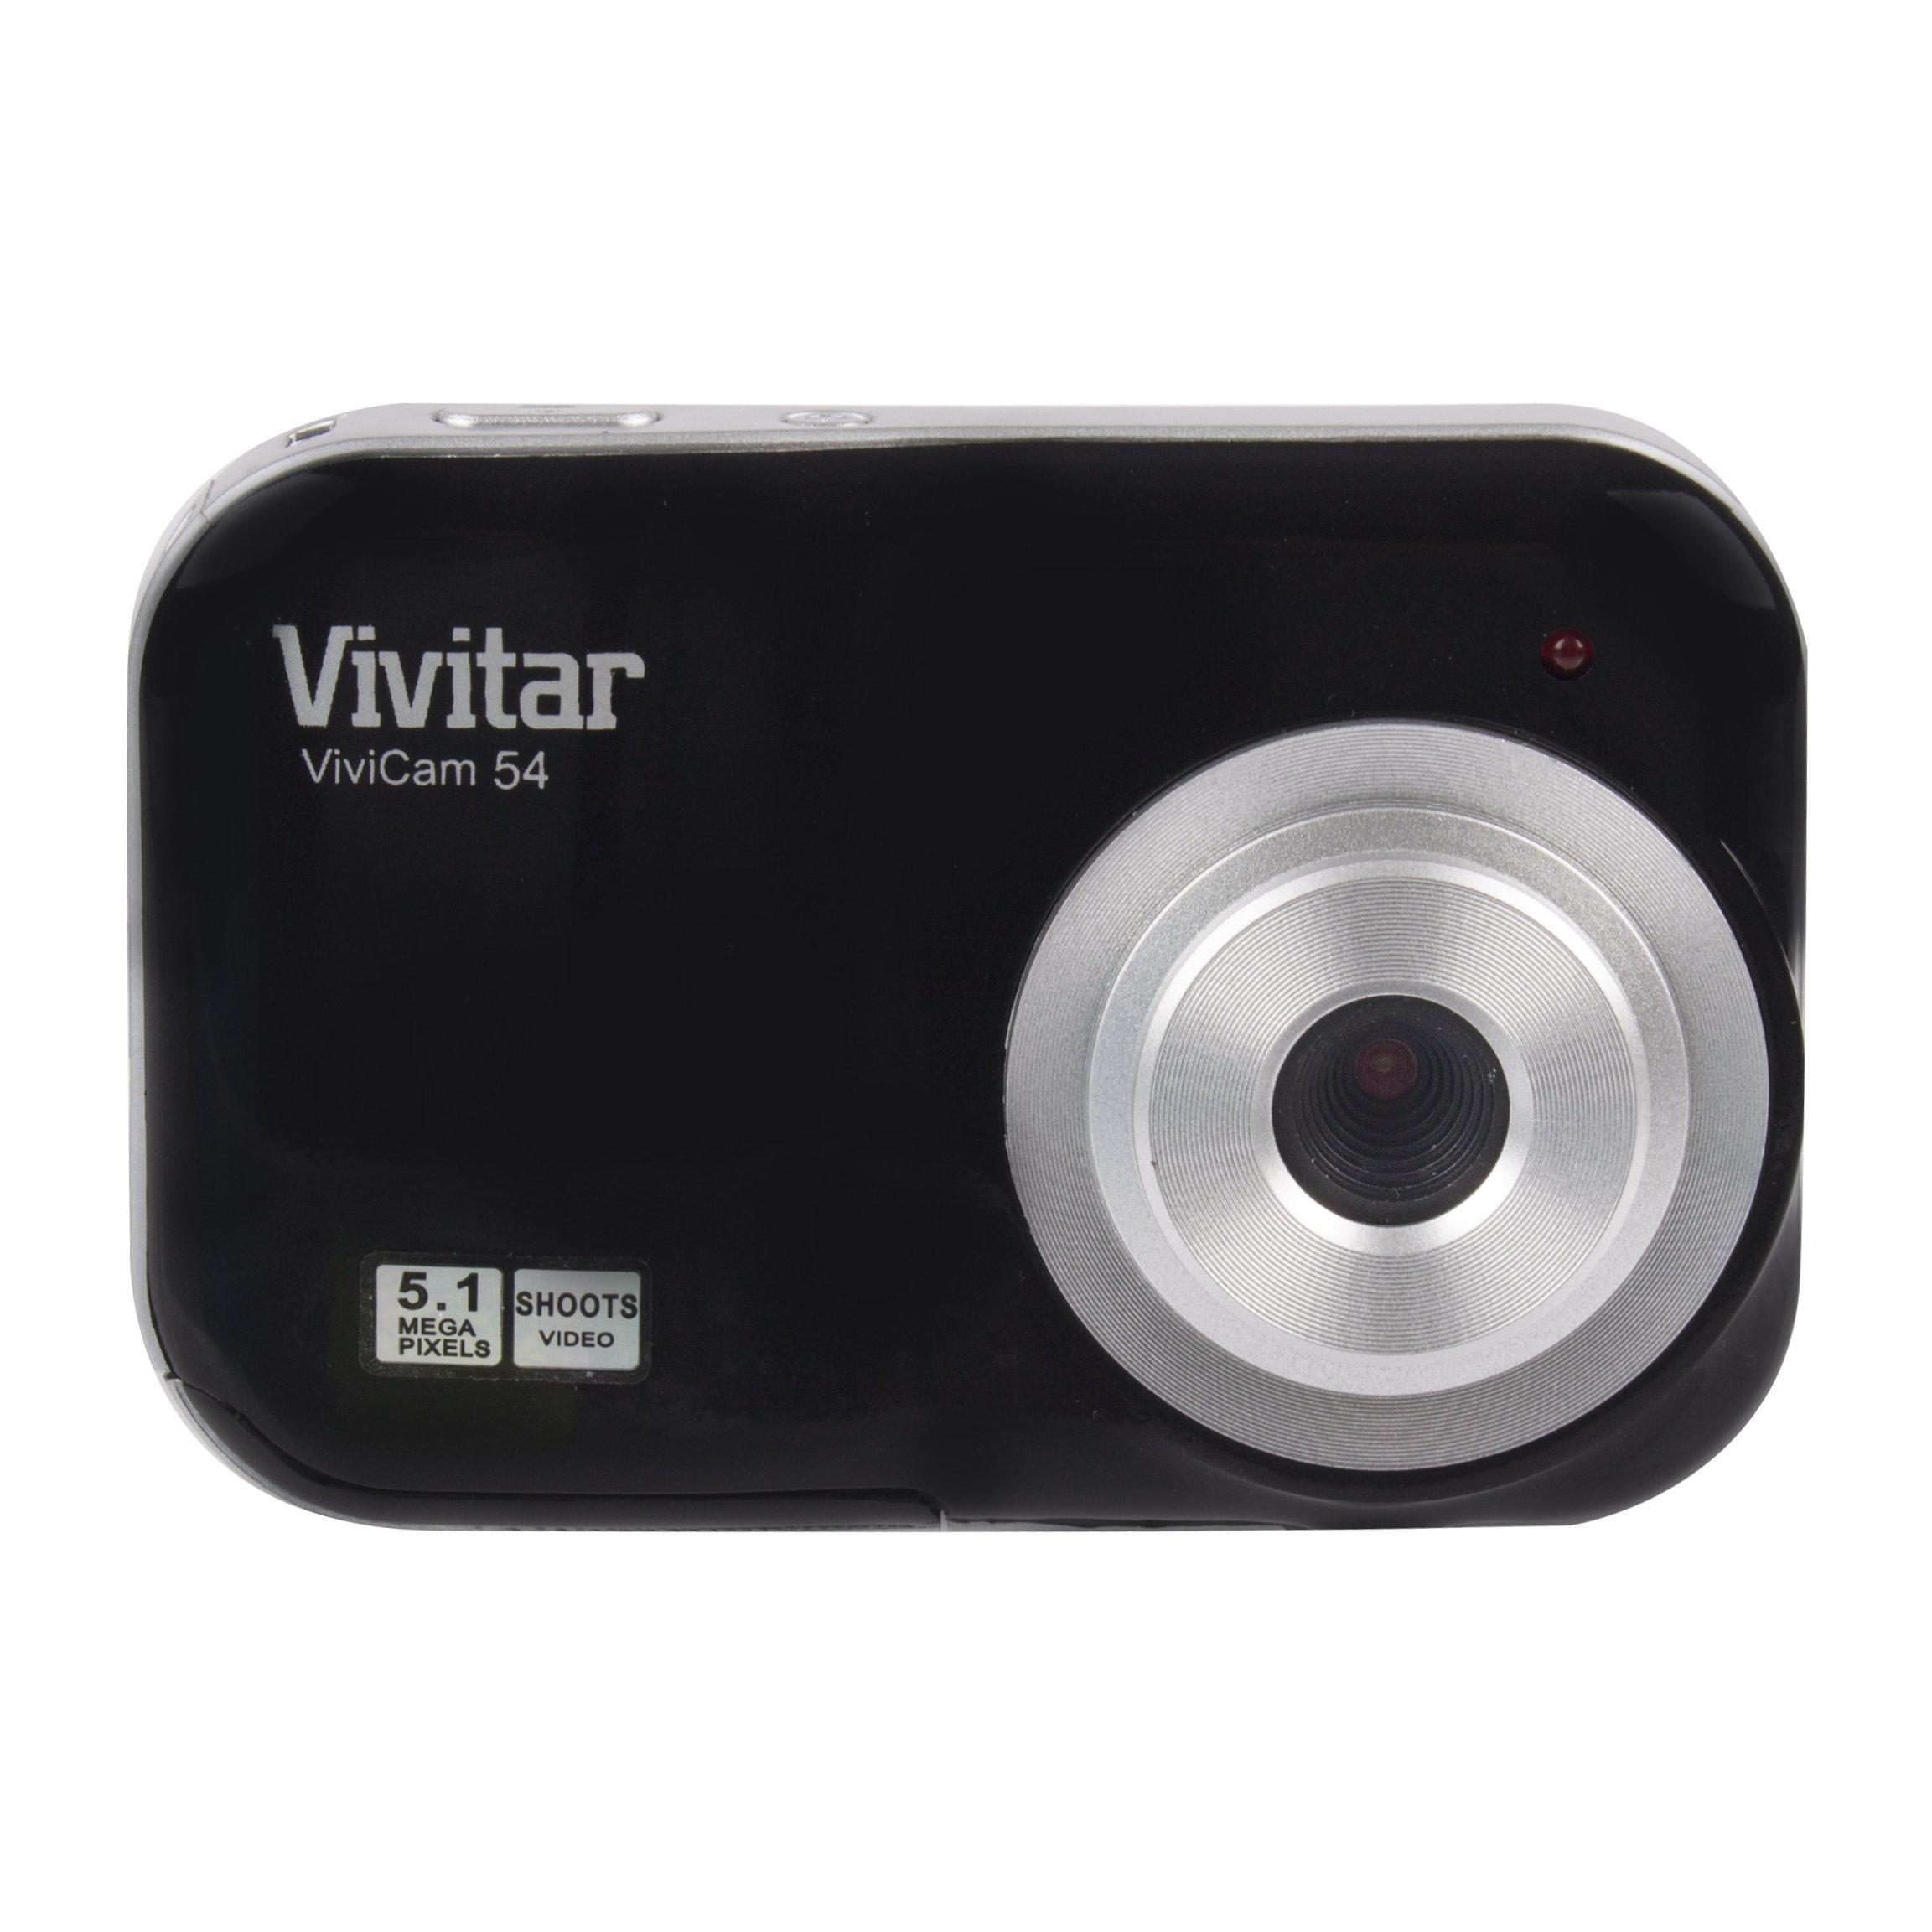 Vivitar V46-WHT 5.1MP Digital Camera with 1.8 tft, Colors May Vary by Vivitar